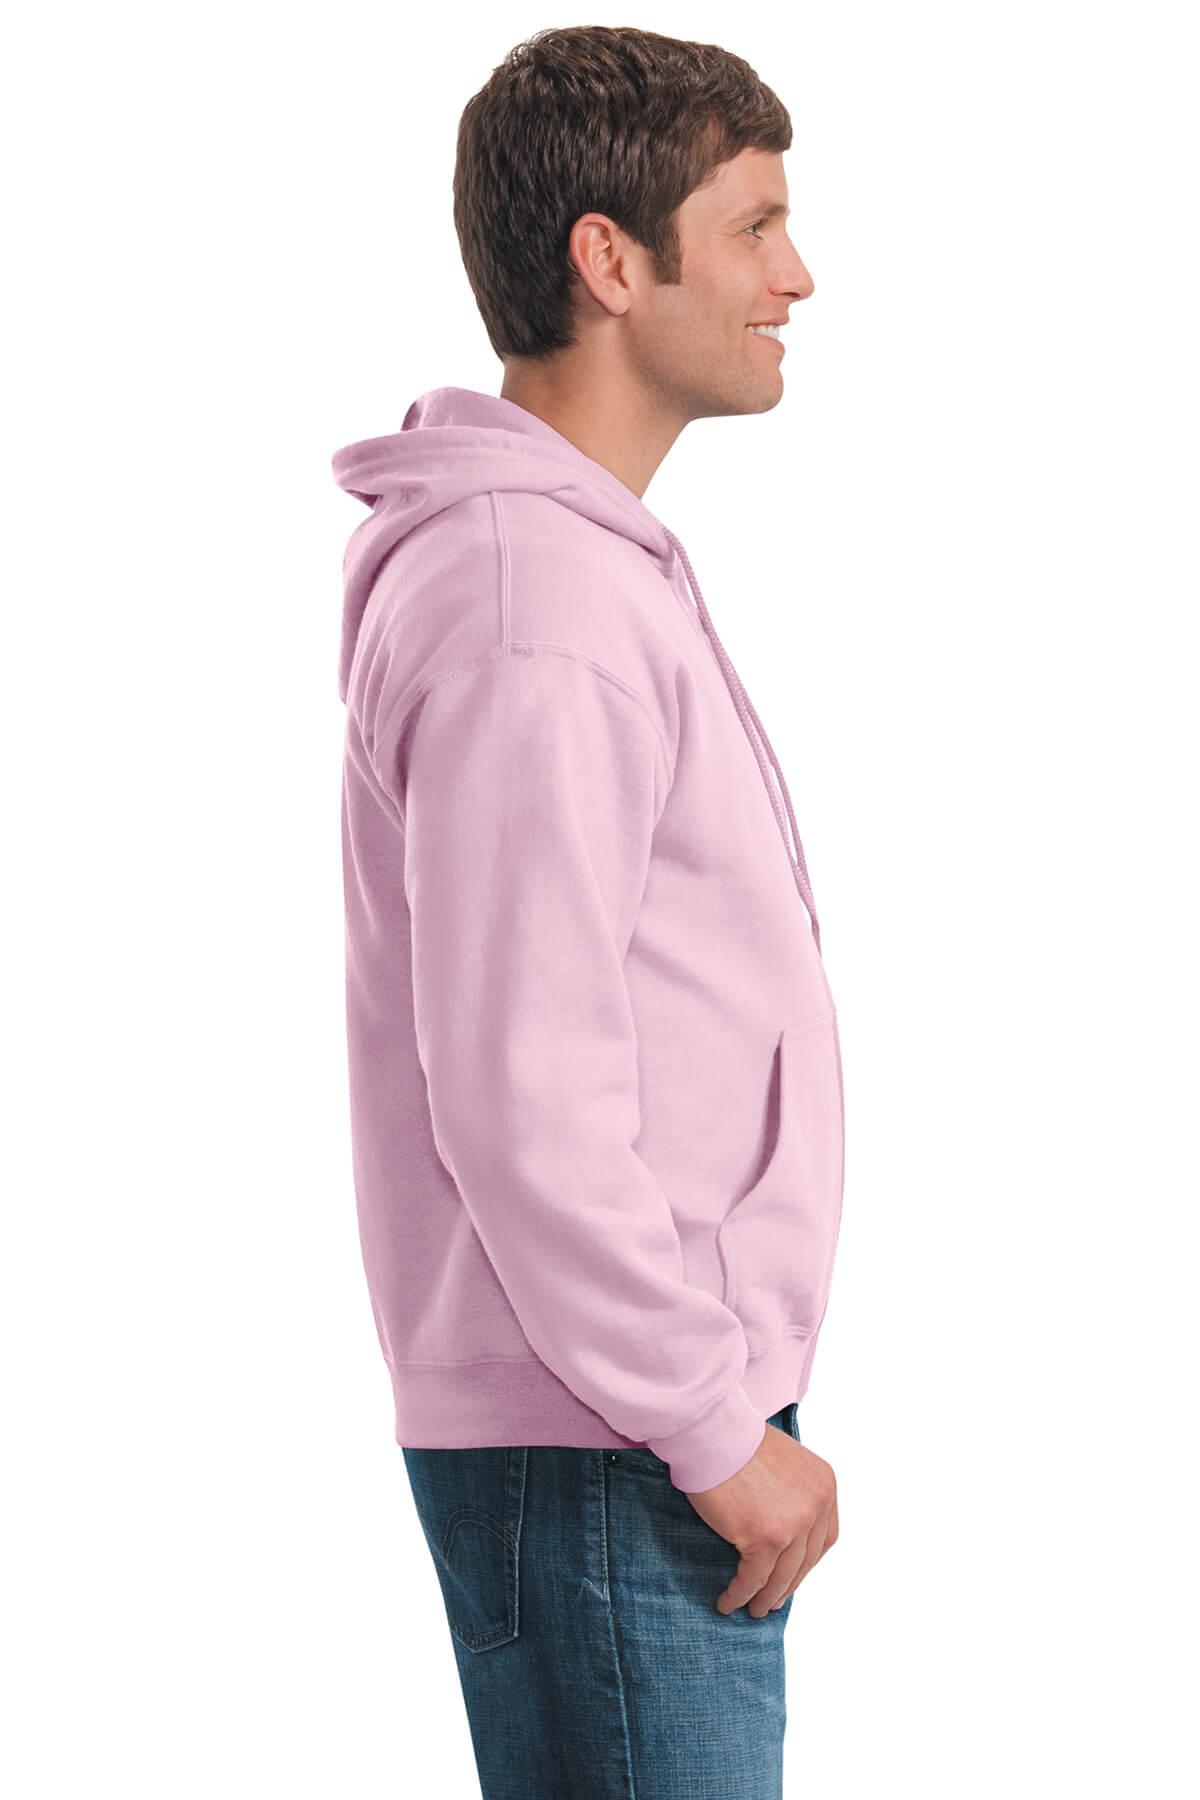 18600-light-pink-3